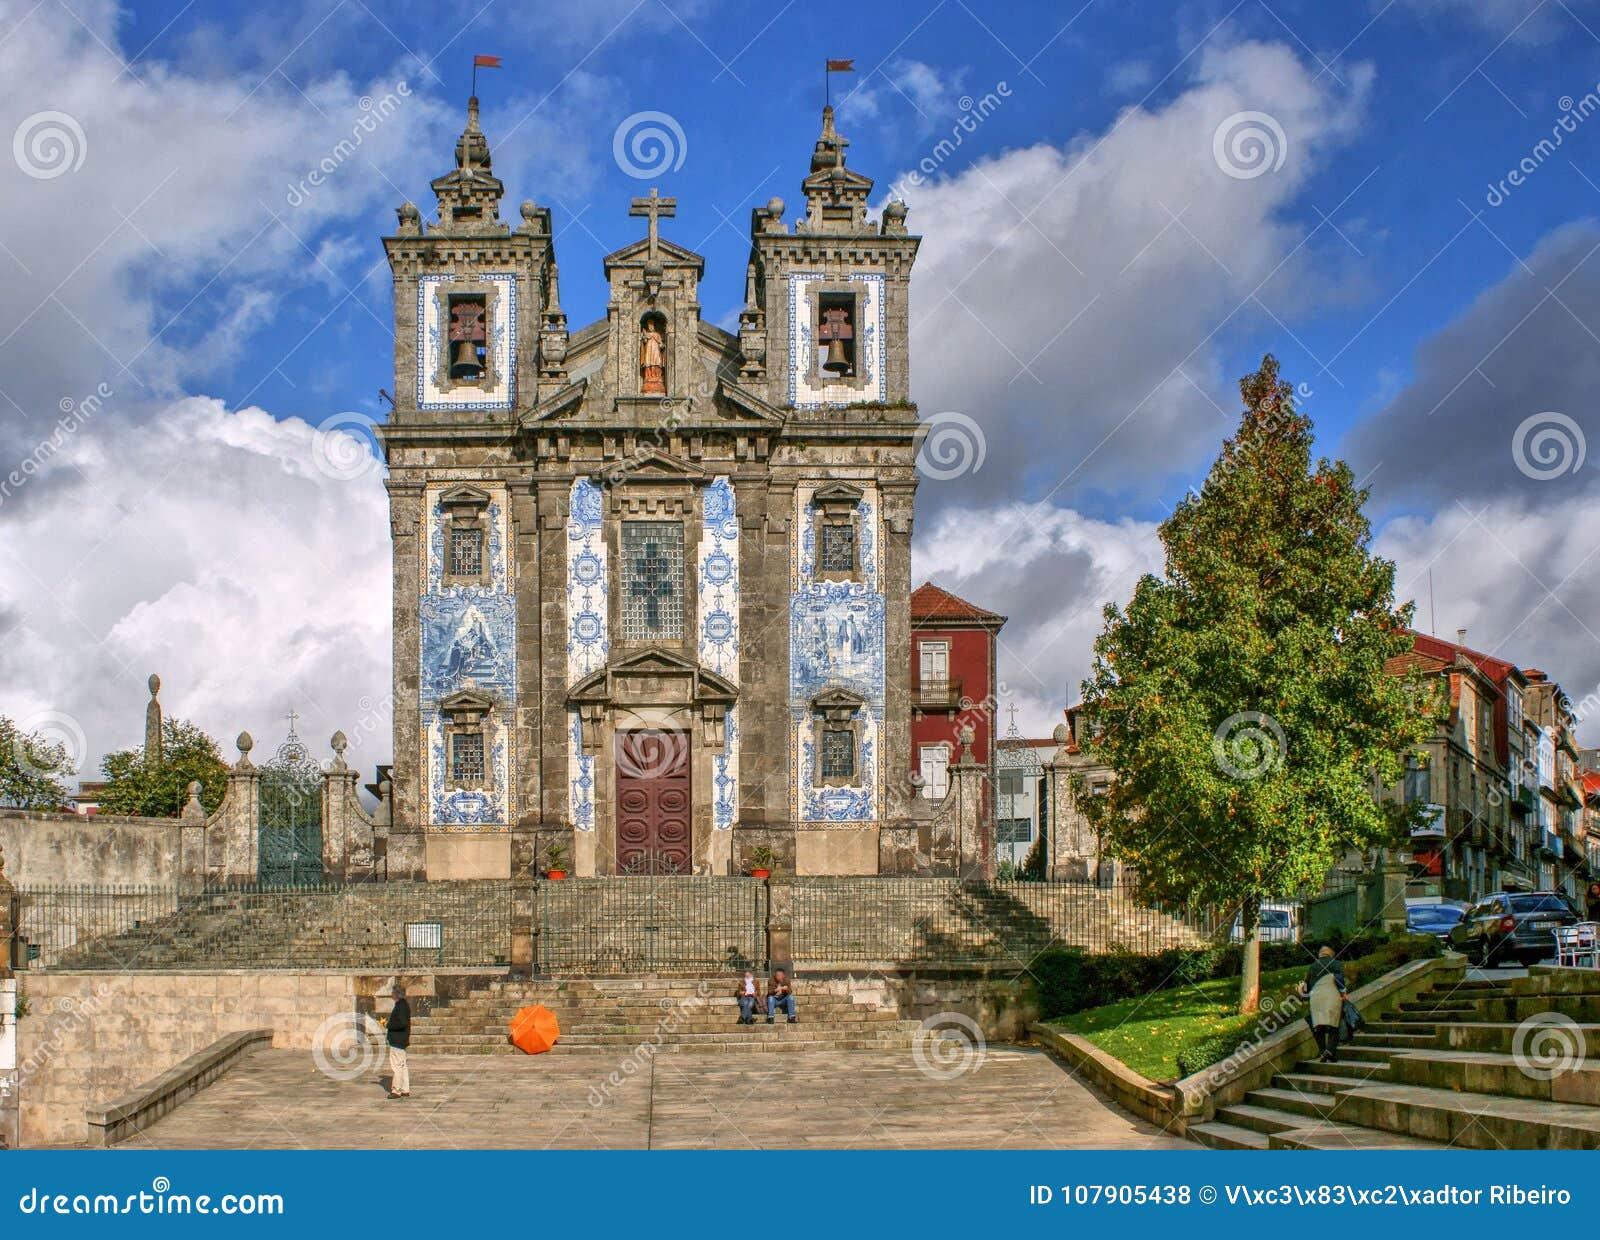 Saint Ildefonso church